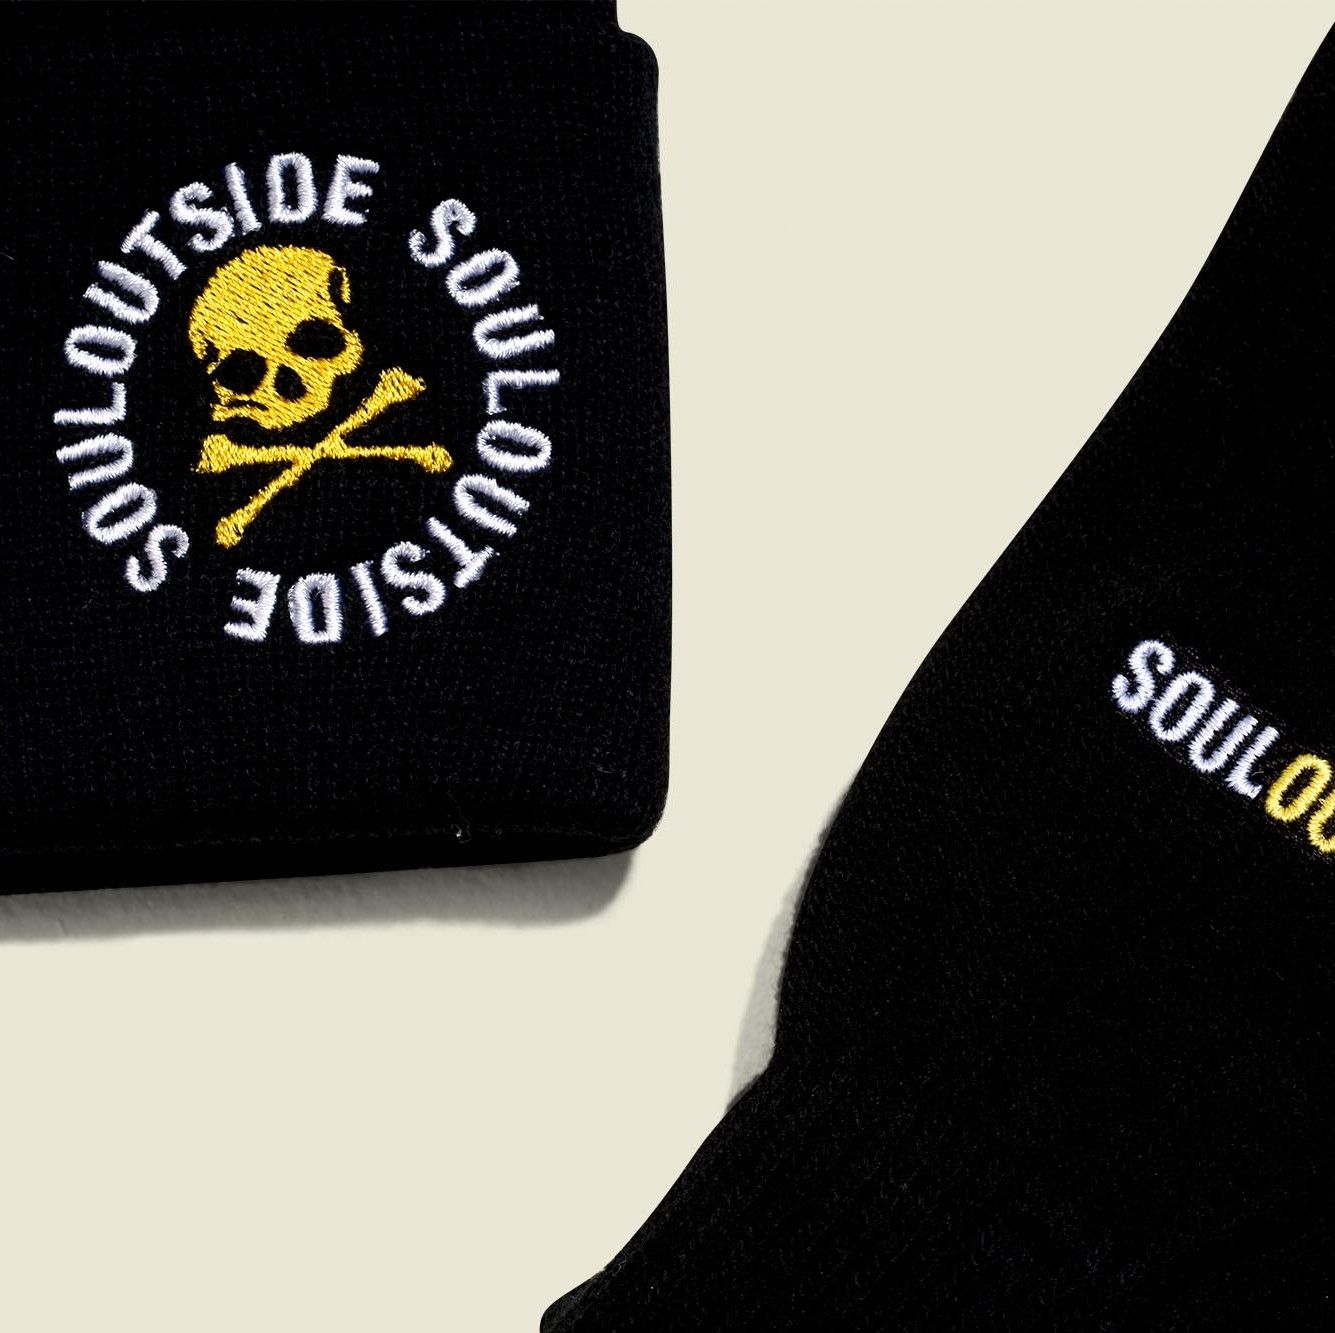 Black beanie with gloves